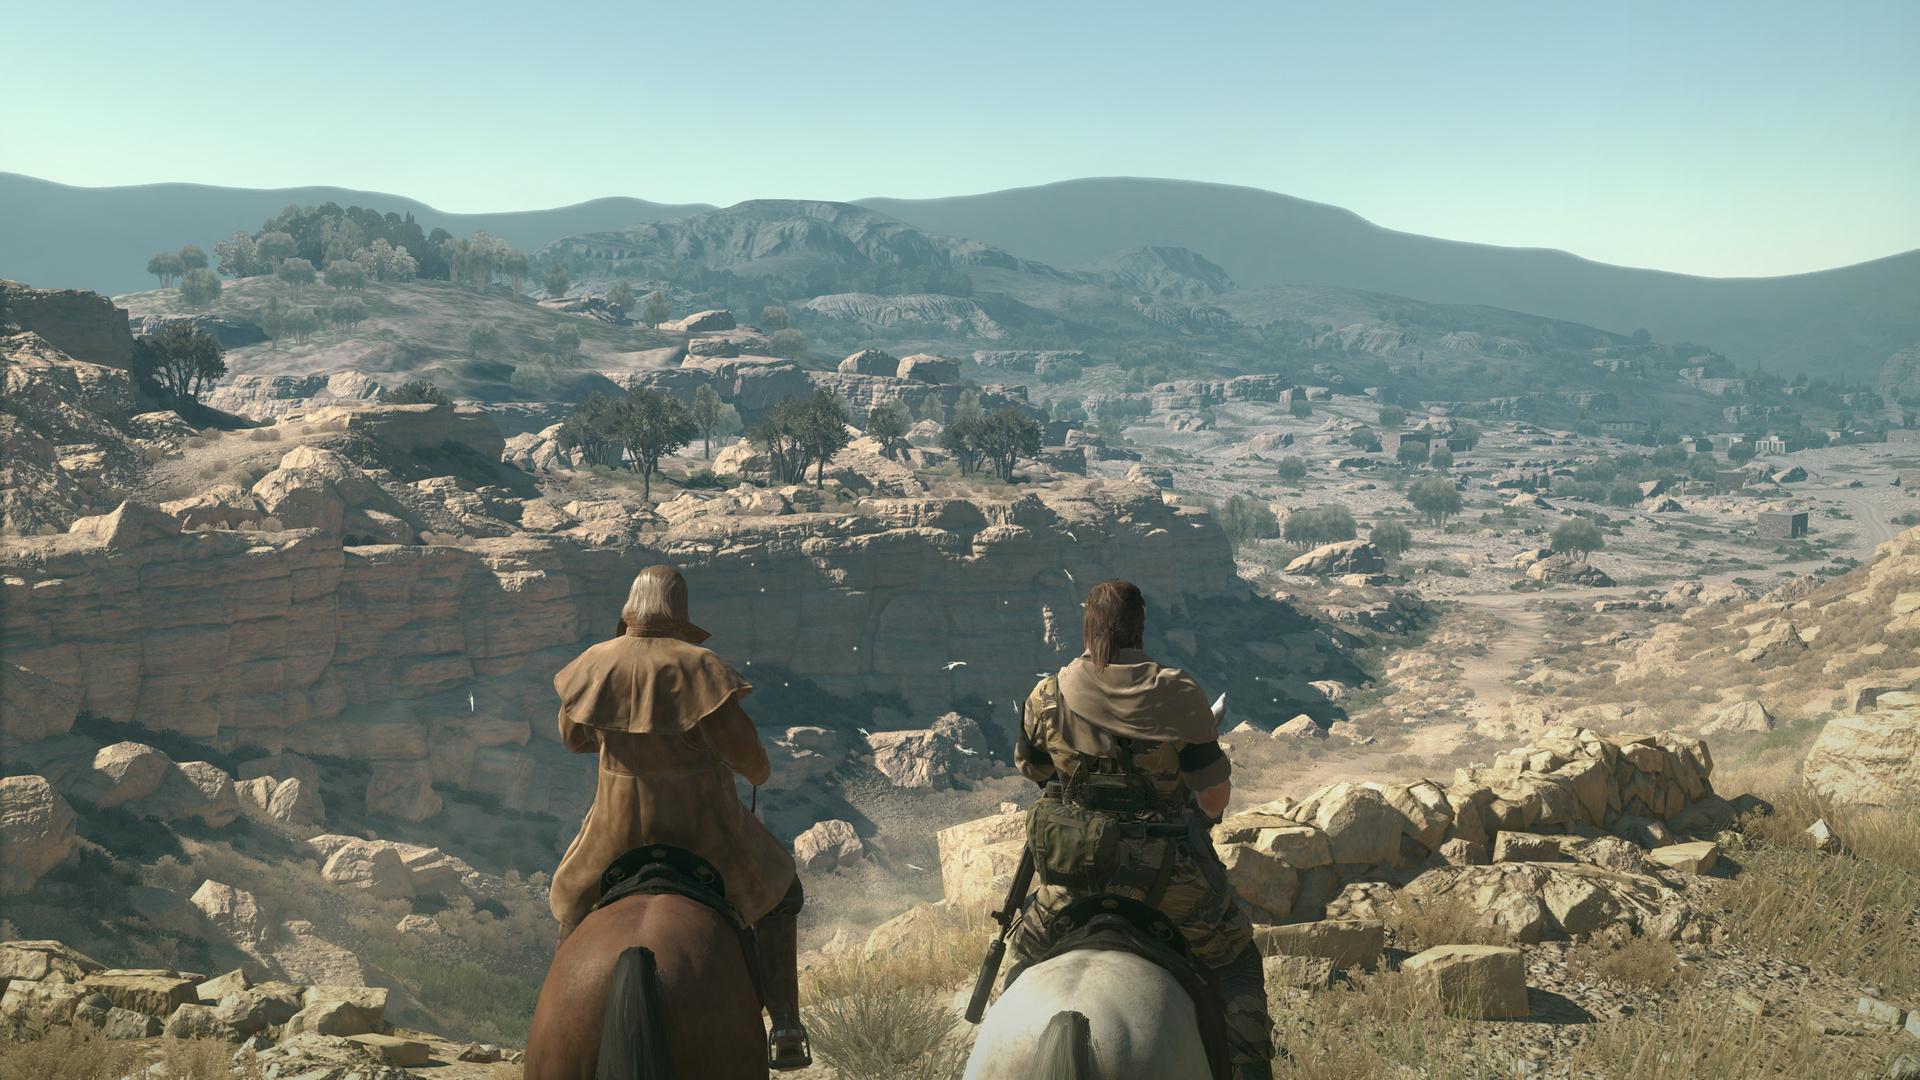 загруженное (29).jpg - Metal Gear Solid 5: The Phantom Pain